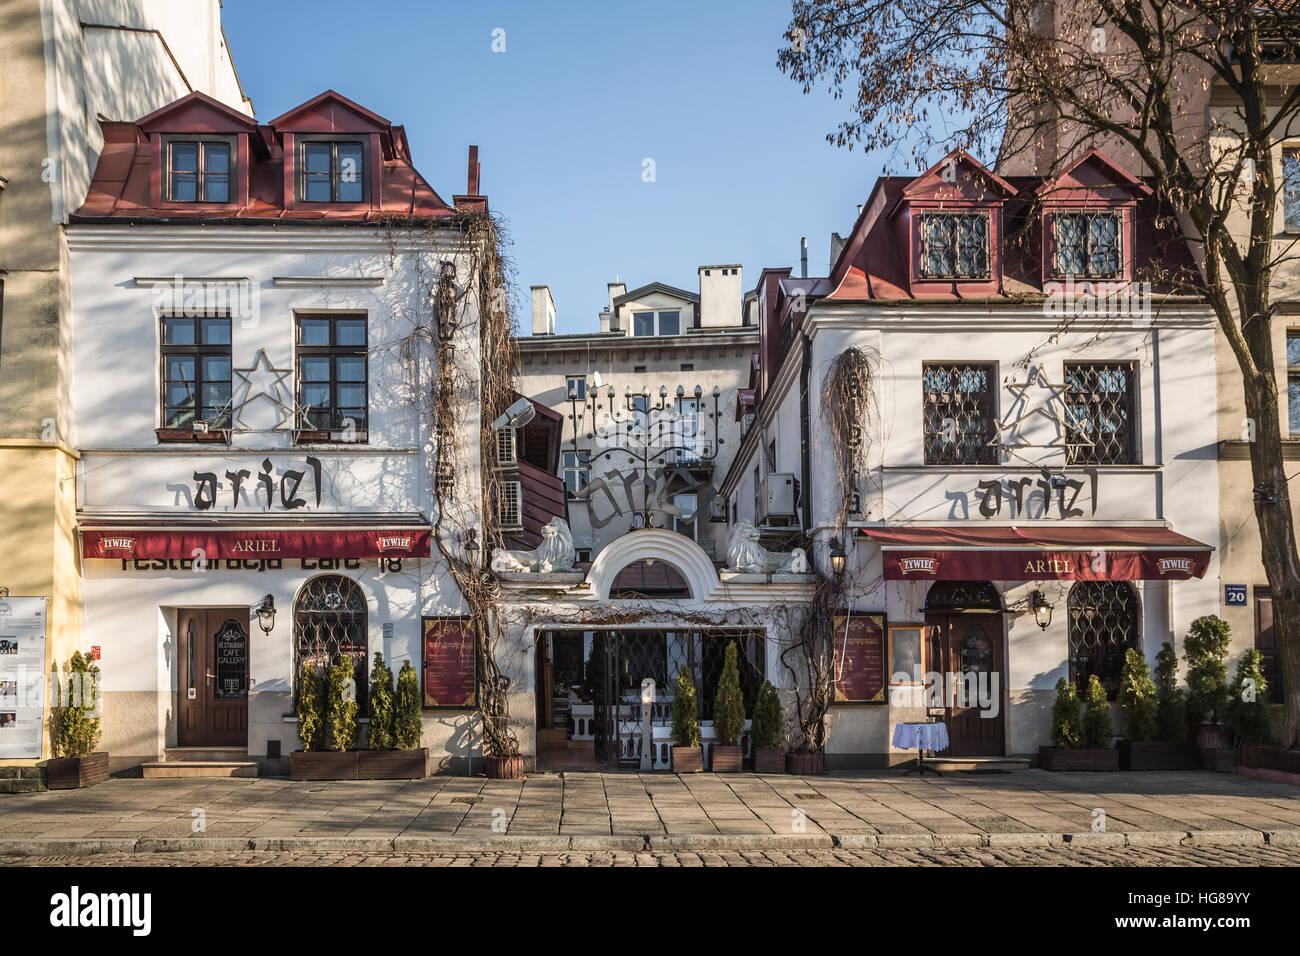 Poland, Krakow, Ariel restaurant at Kazimierz district - Stock Image